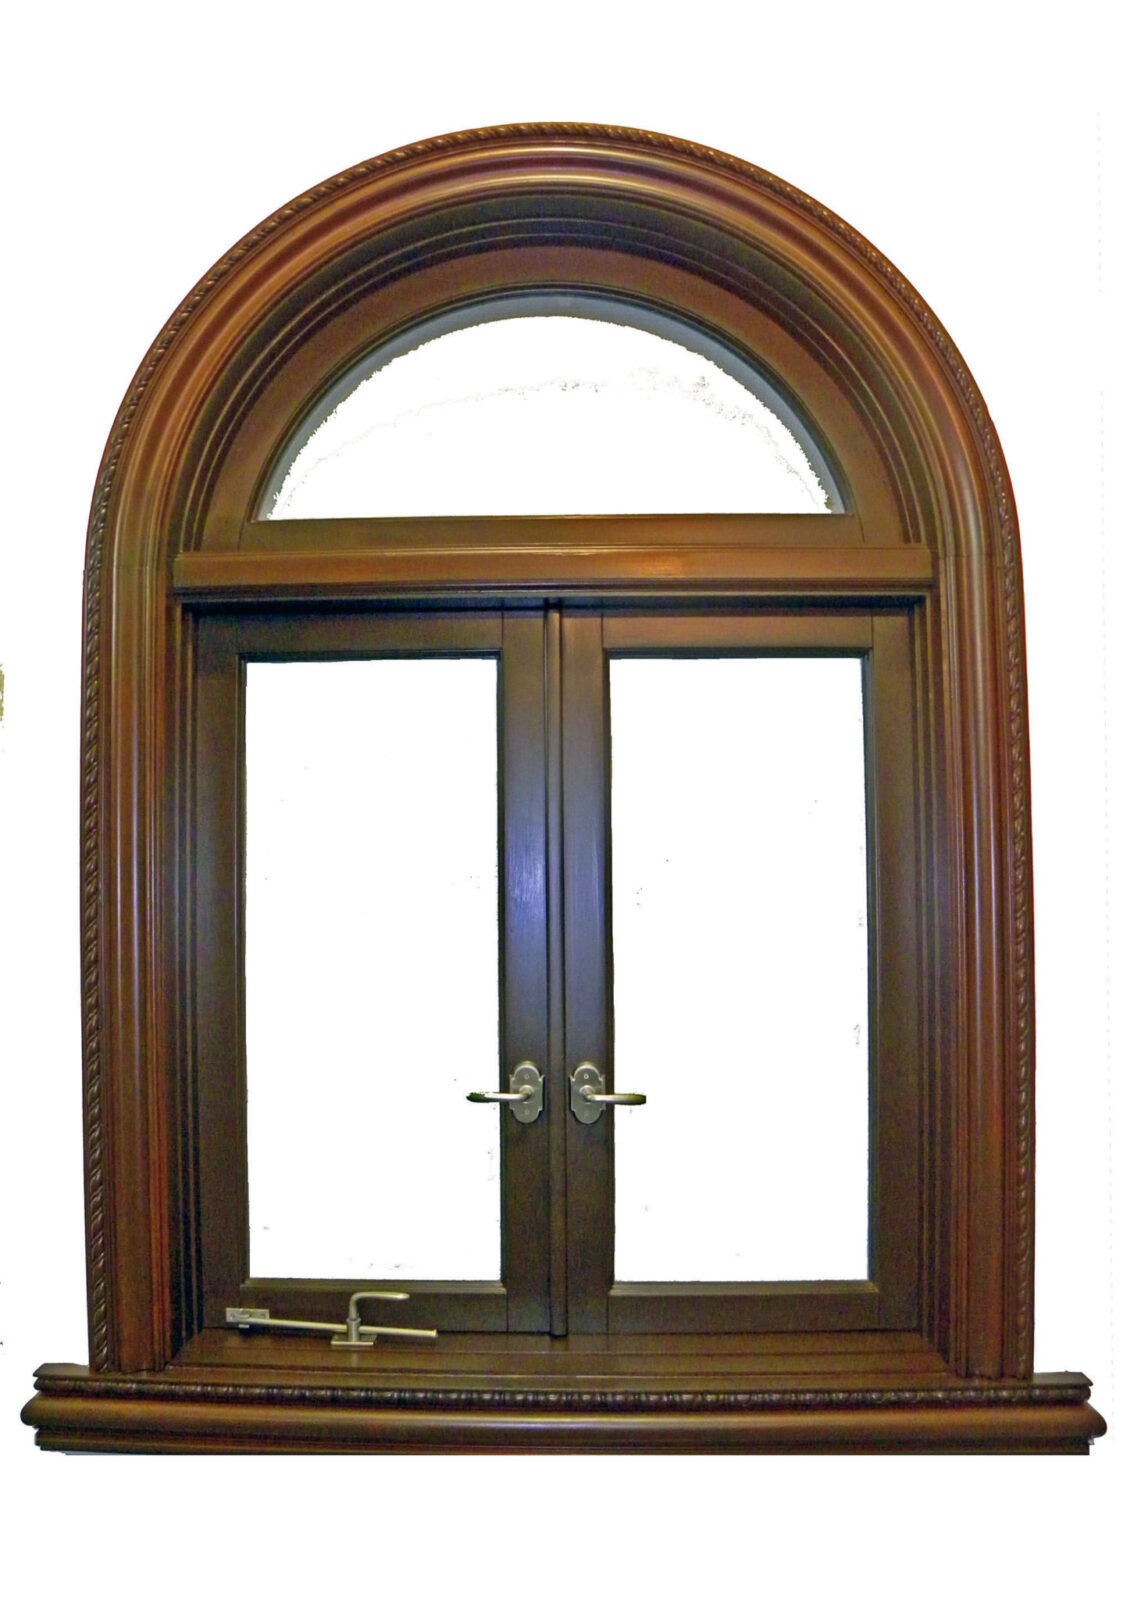 MARATHON KEY MAHOGANY CASEMENT WINDOWS